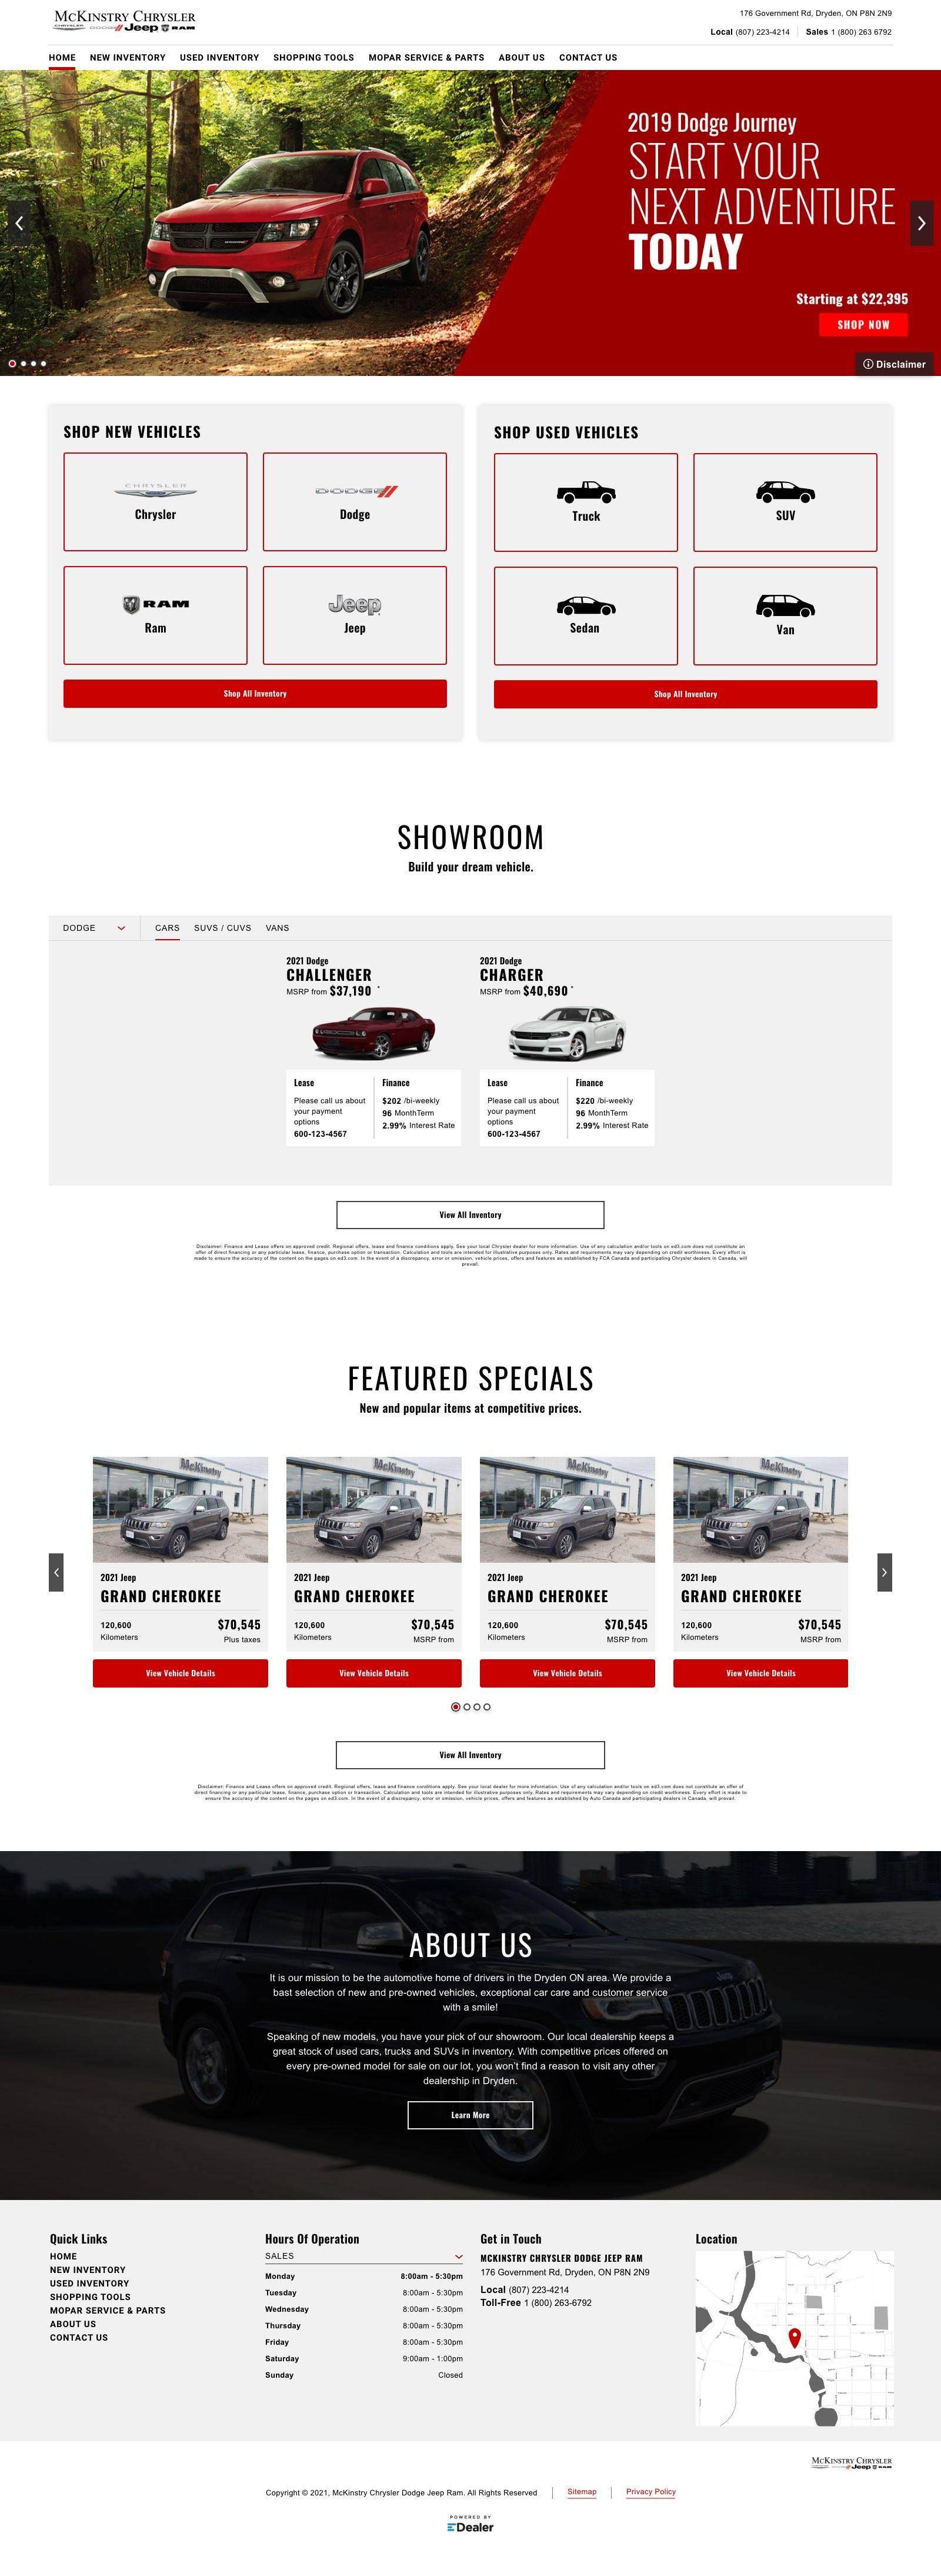 McKinstry Chrysler Dodge Jeep Ram